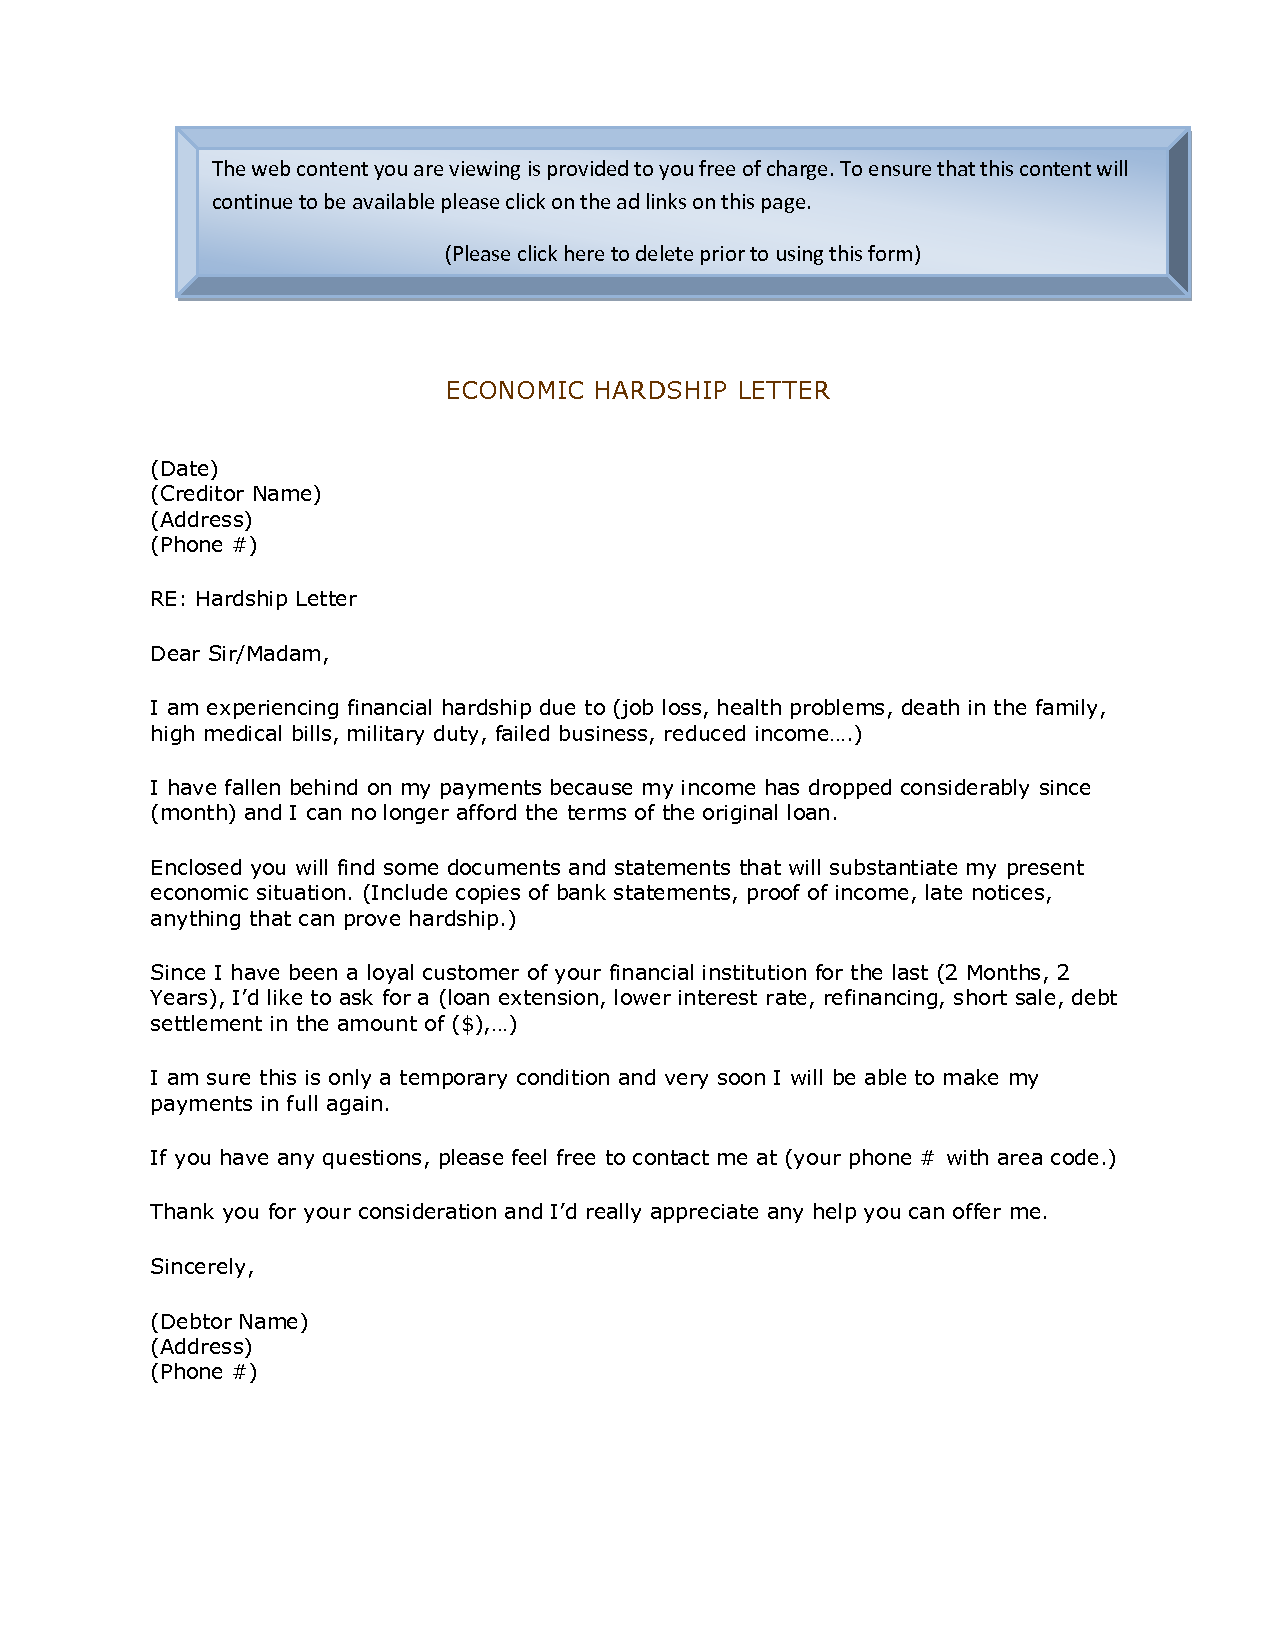 Economic hardship sample letter economic hardship letter 0775 economic hardship sample letter economic hardship letter altavistaventures Choice Image